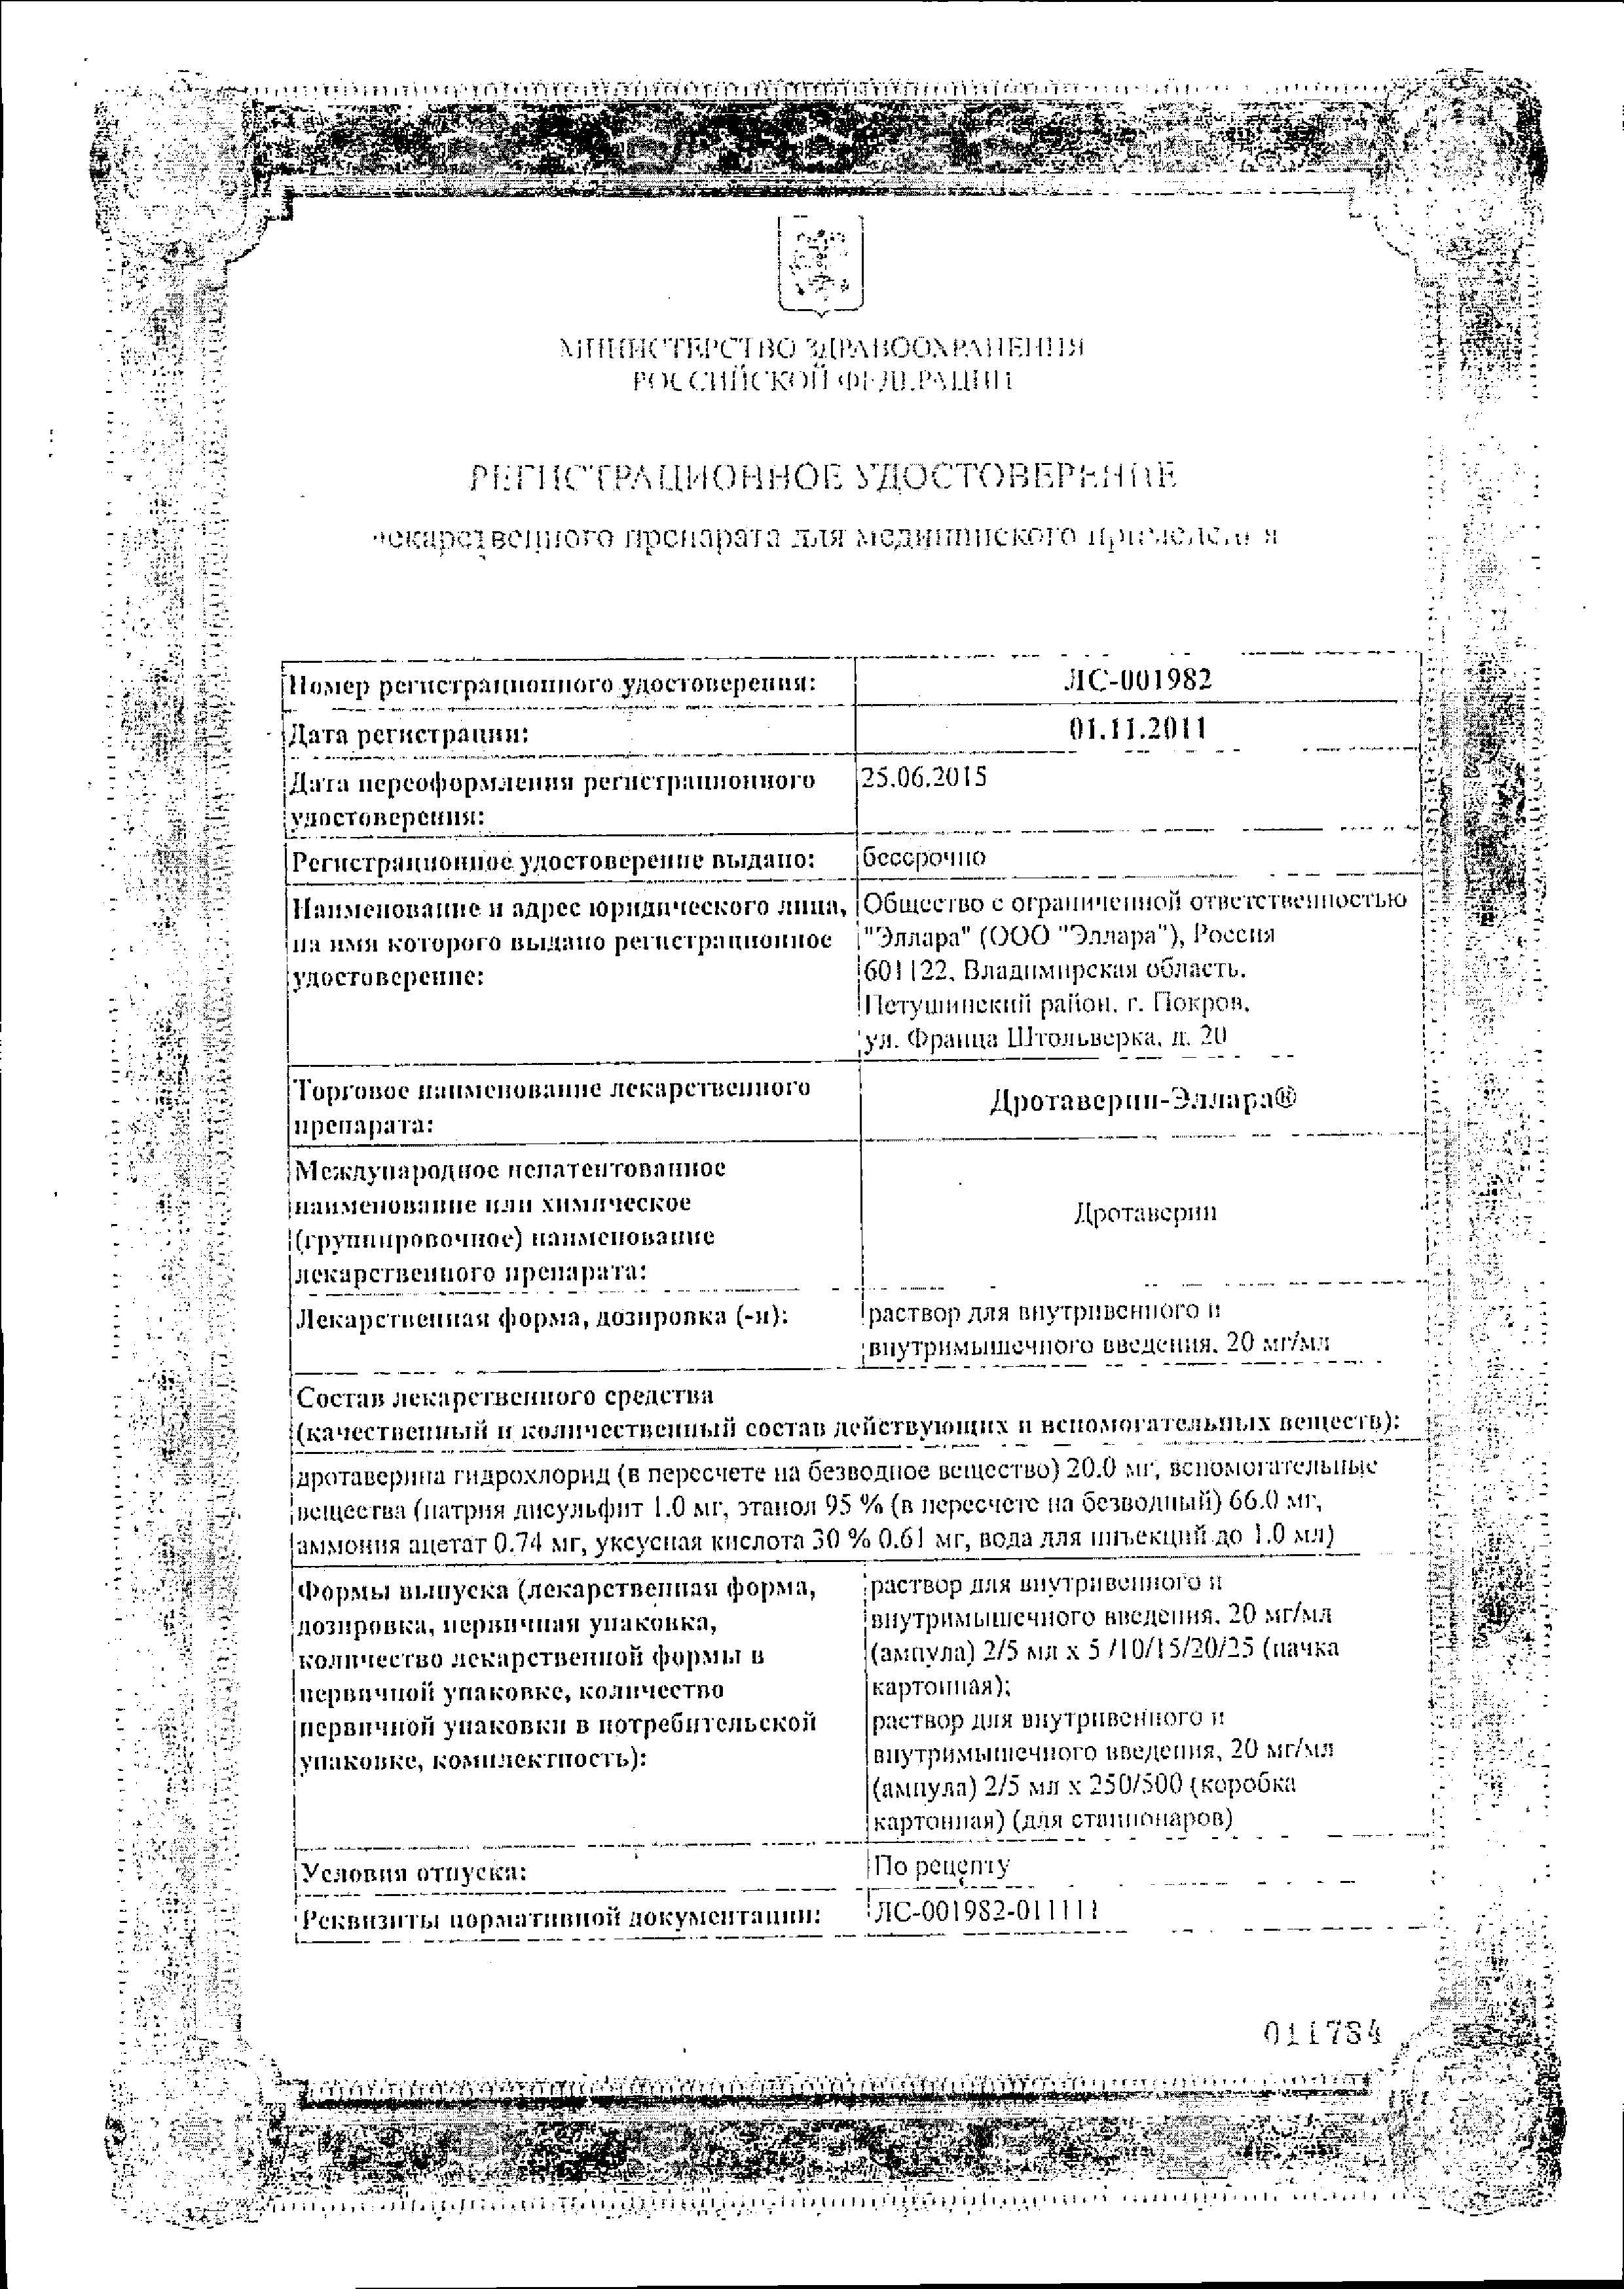 Дротаверин-Эллара сертификат